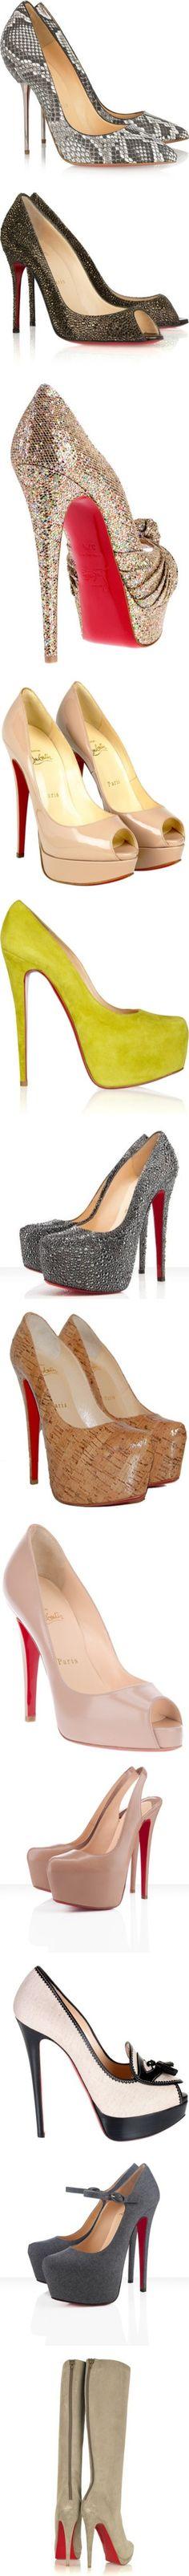 Fashionable pumps ♥✤   Keep the Glamour   BeStayBeautiful